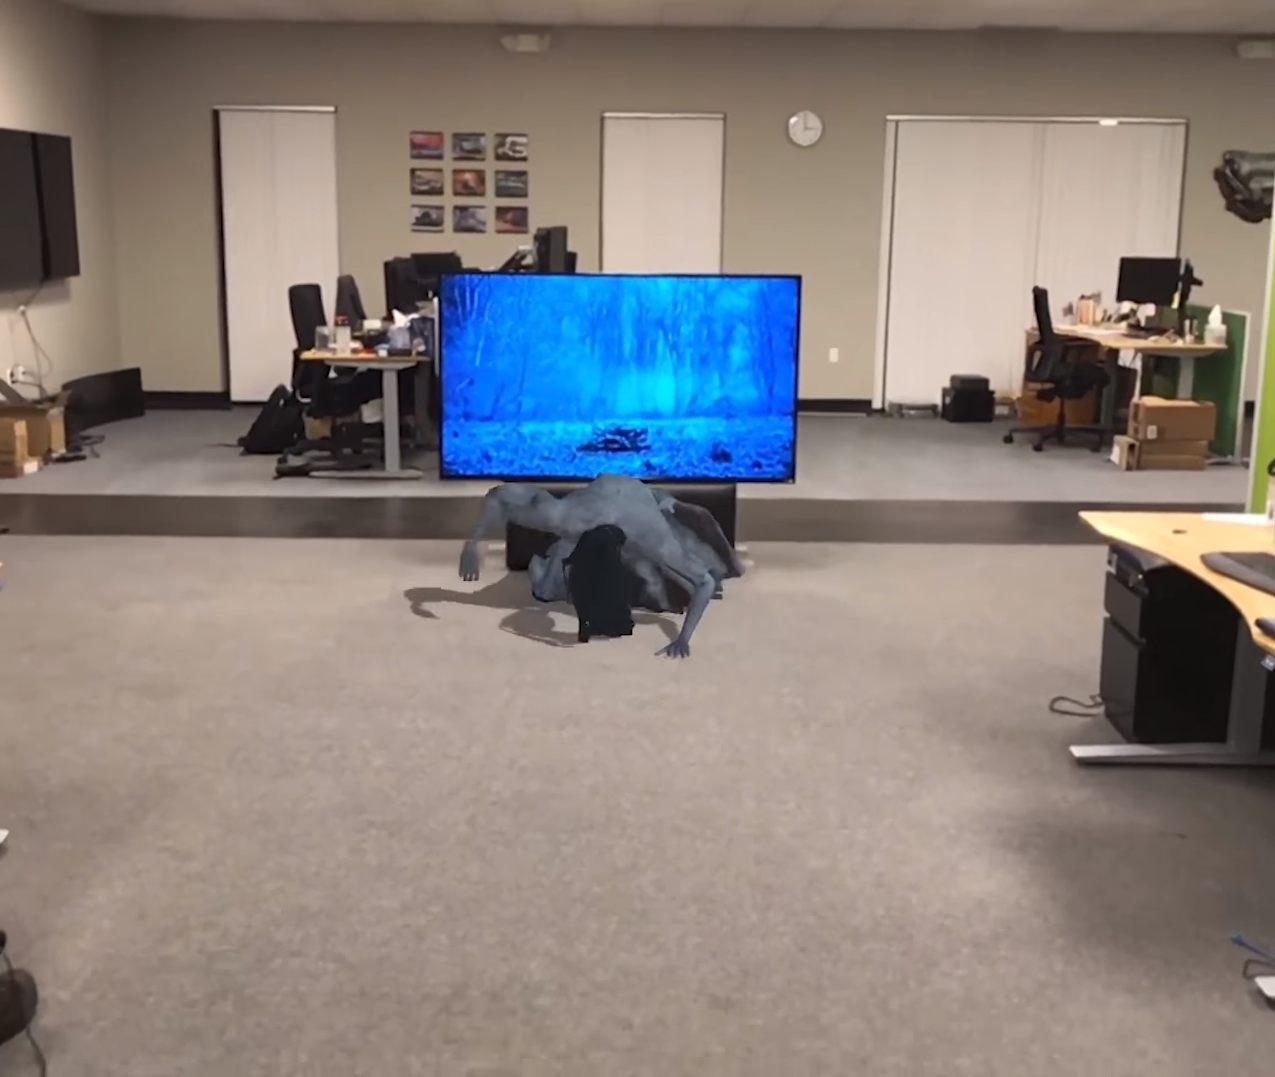 The Ring AR simulation